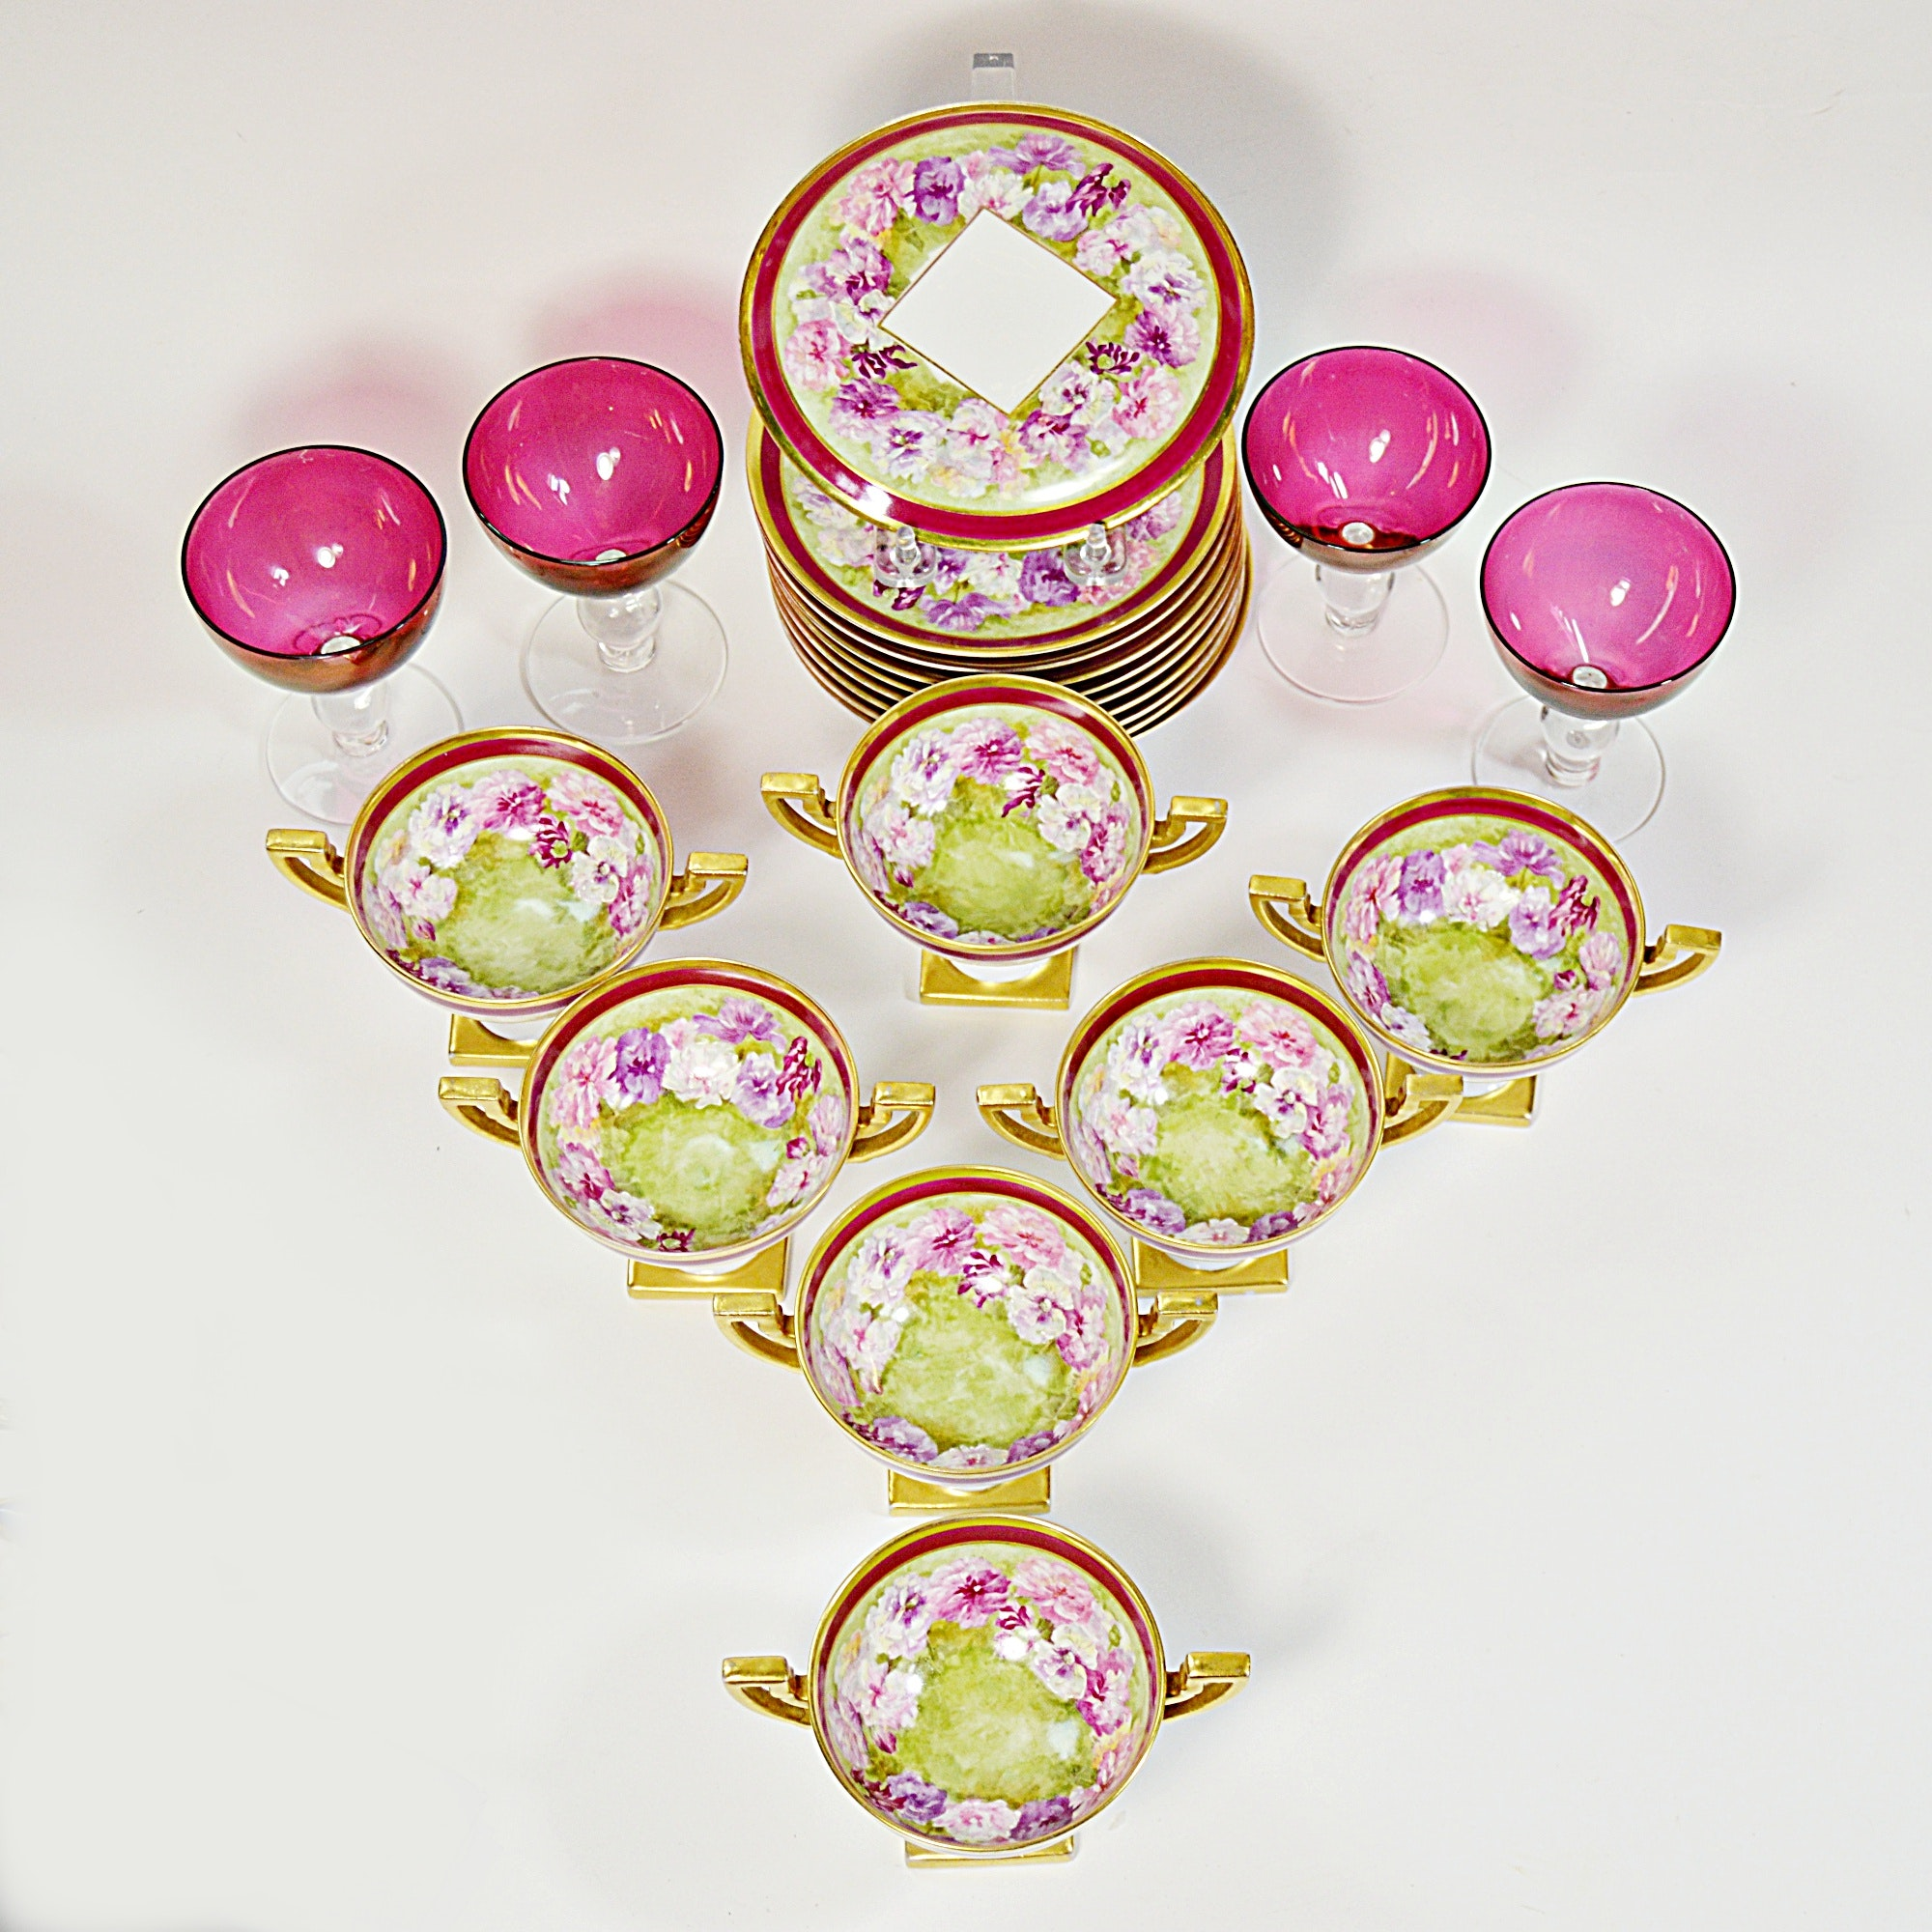 Antique J. Pouyat Limoges Porcelain Teaset and Ruby Glass Goblets